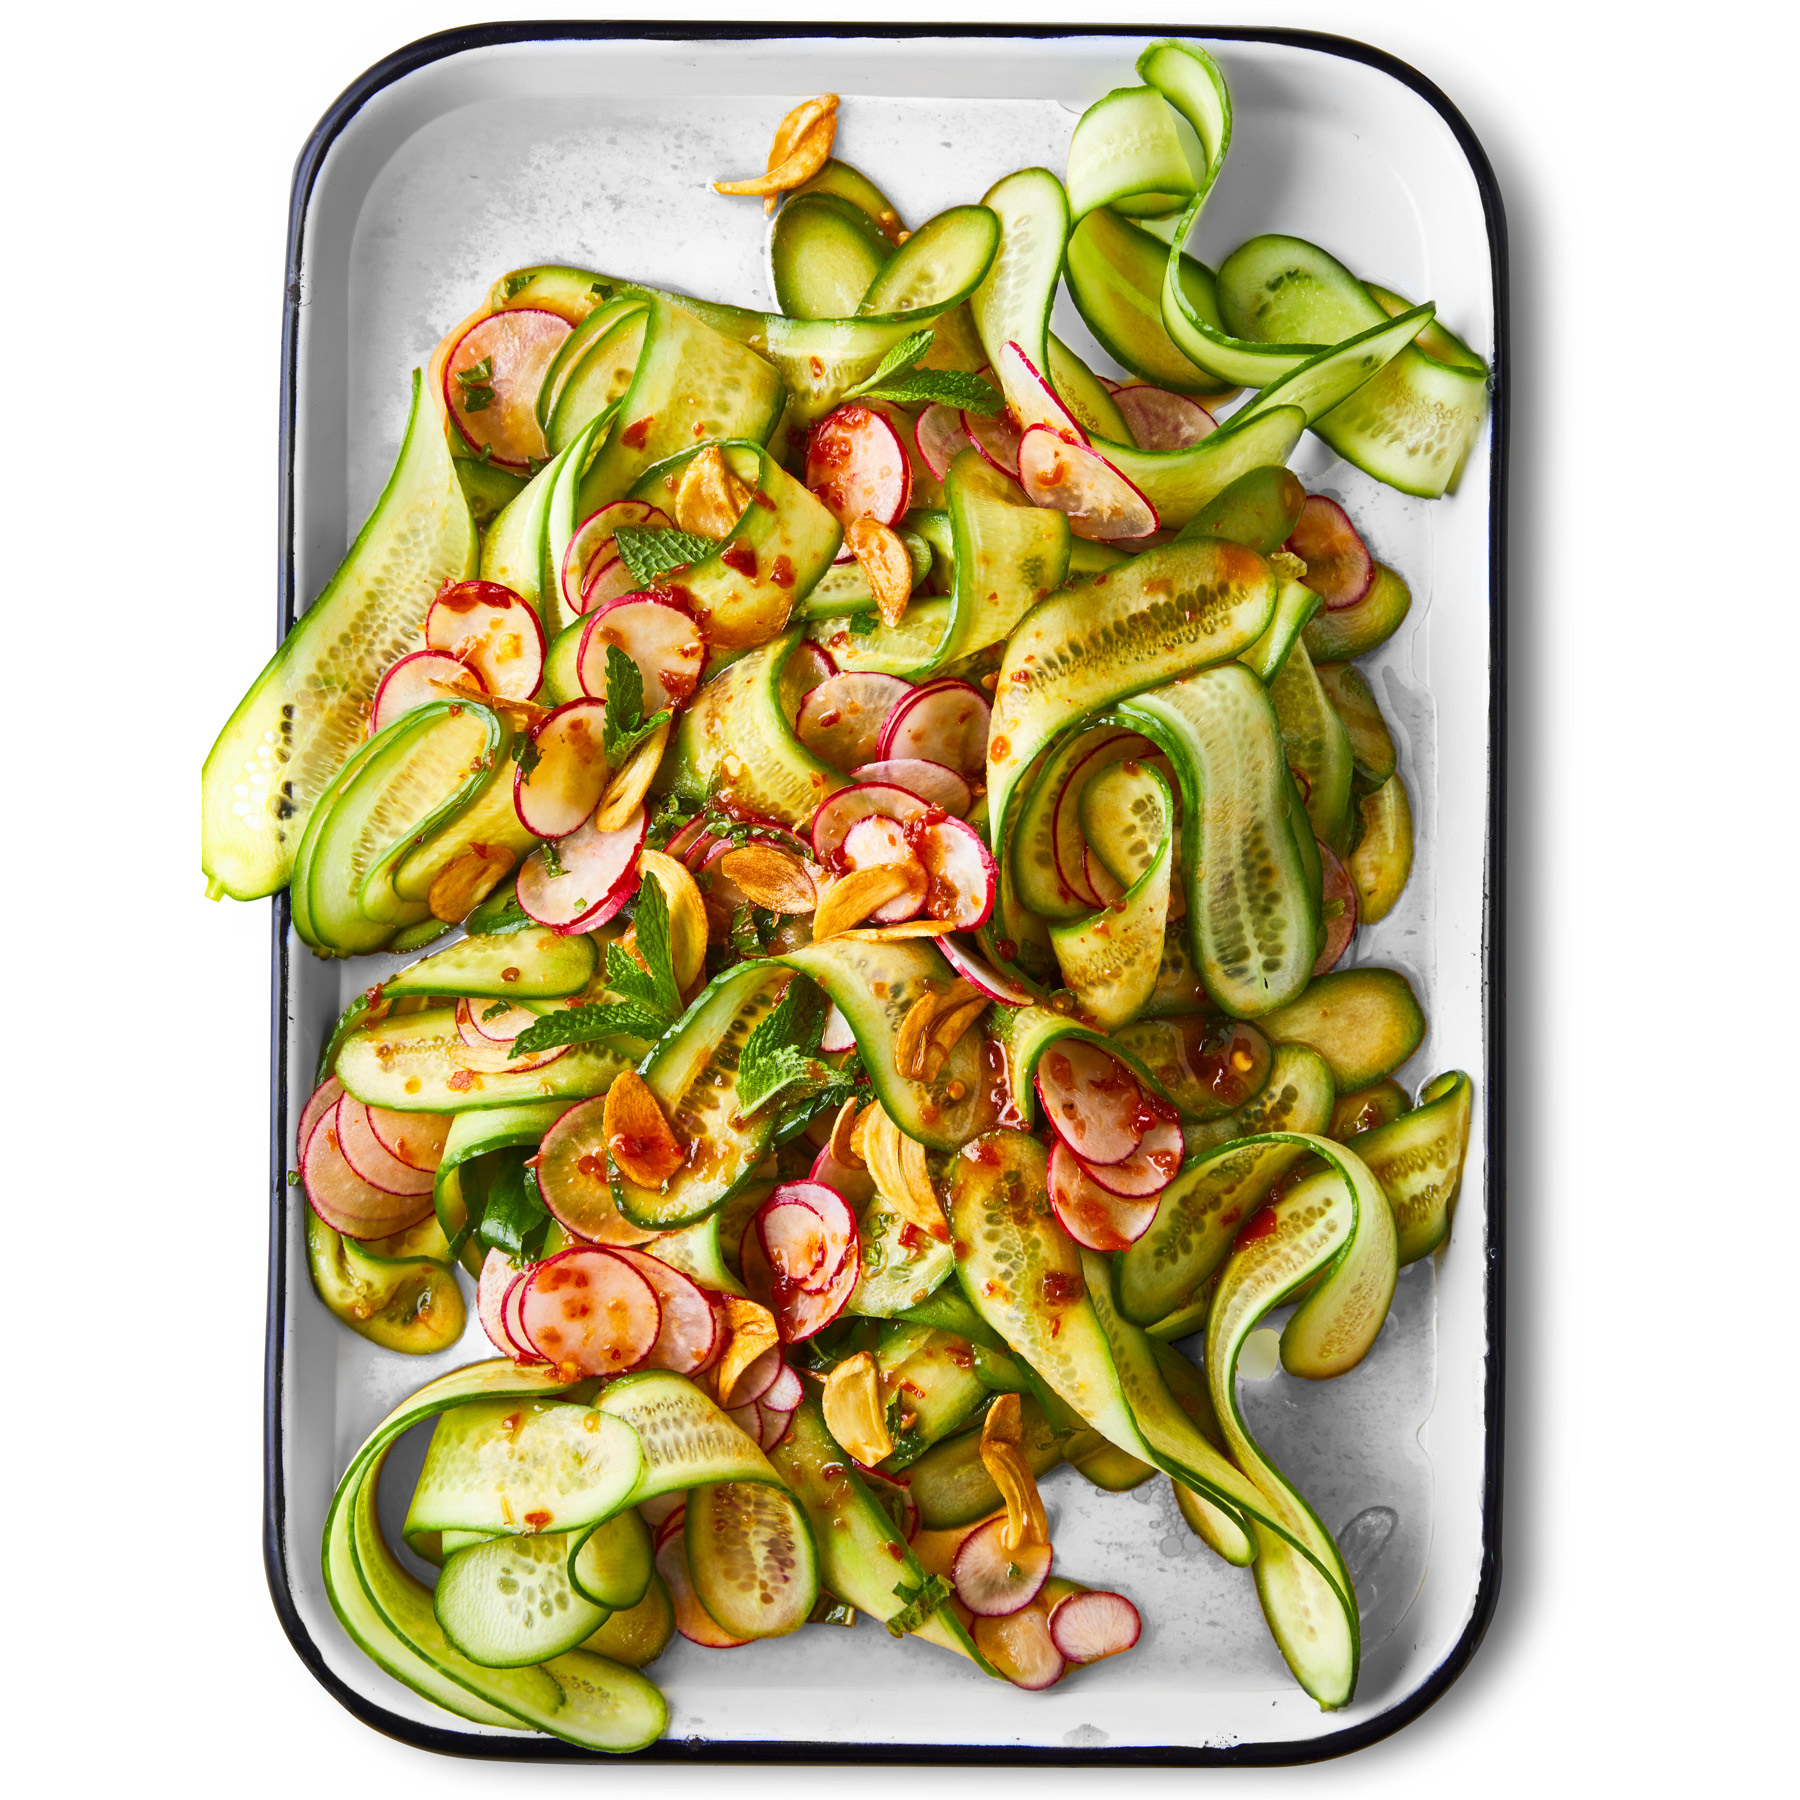 Cucumber-Radish Salad with Toasted Garlic